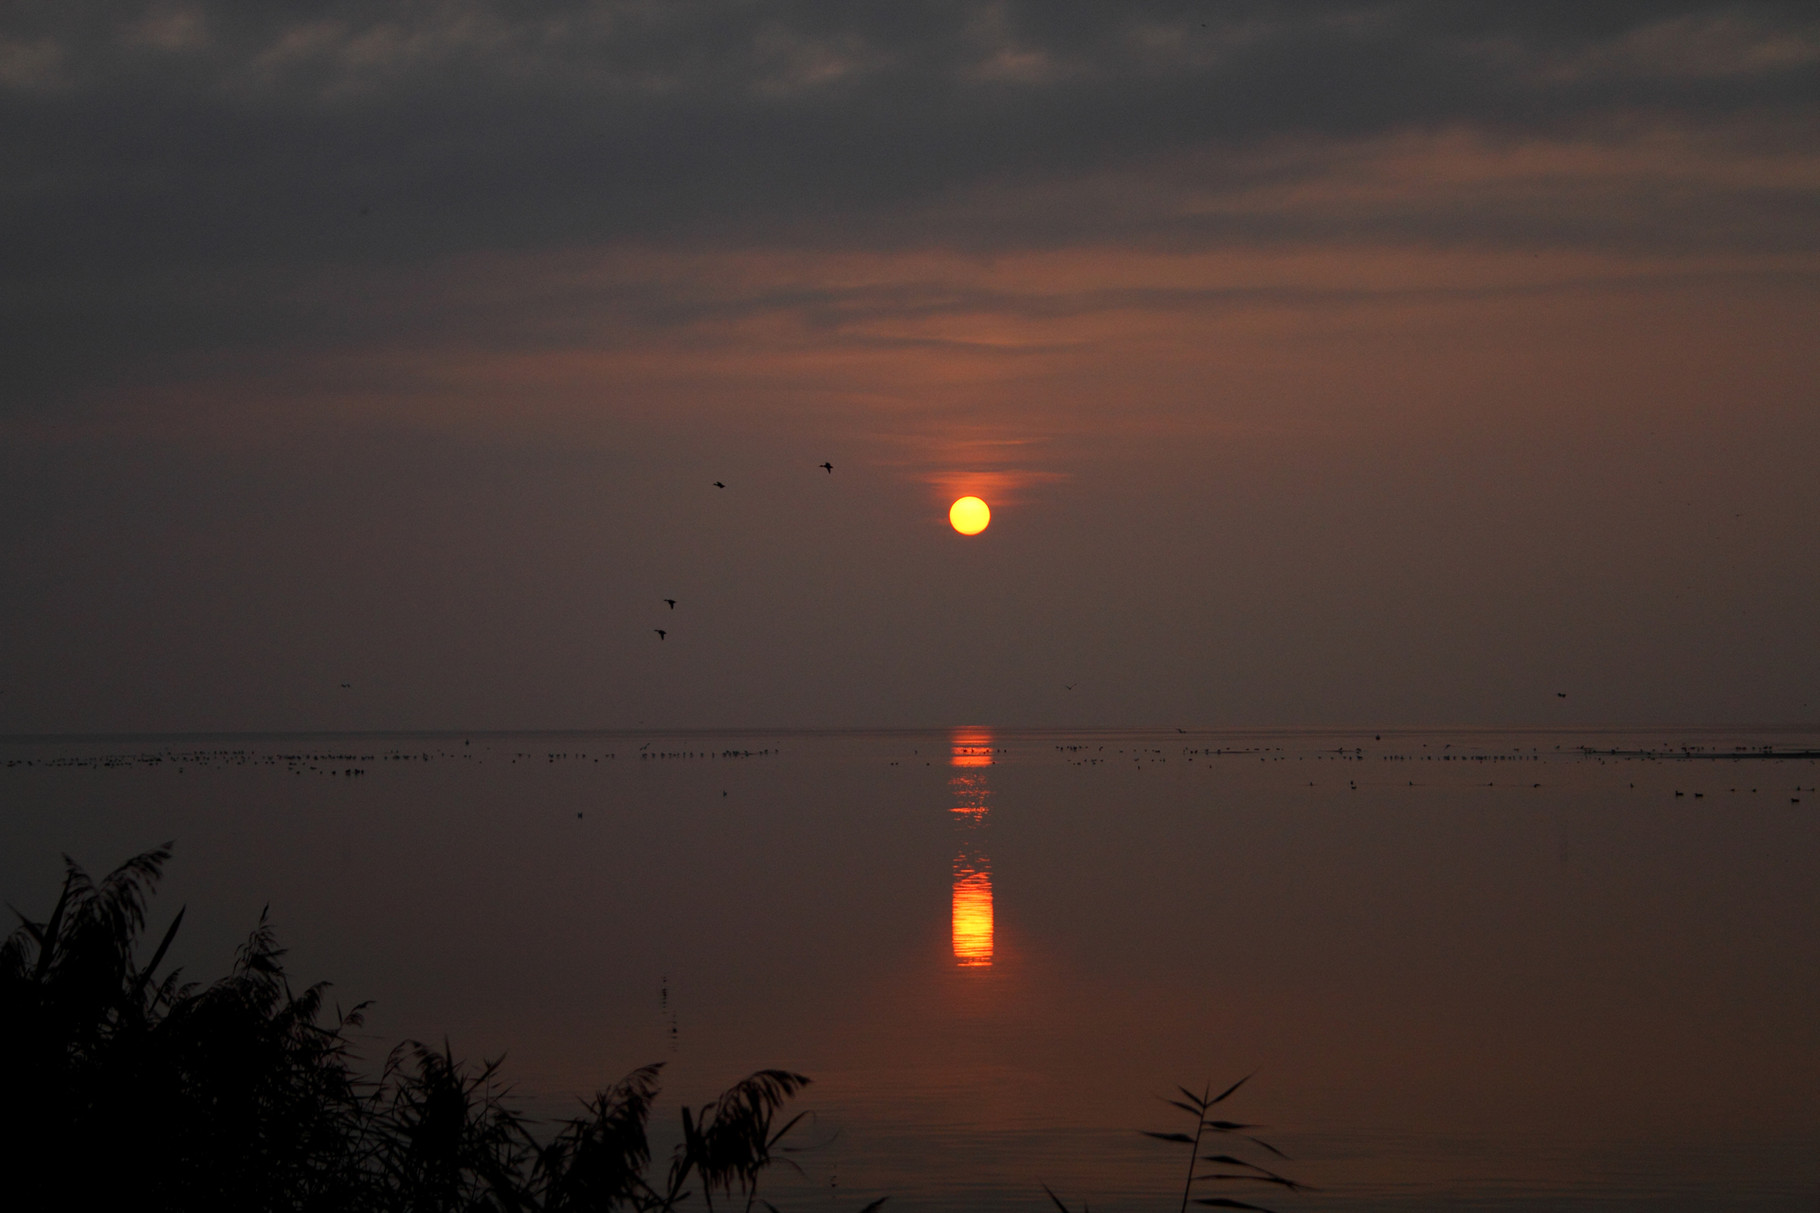 Sonnenuntergang am Neuenburgersee (La Sauge)